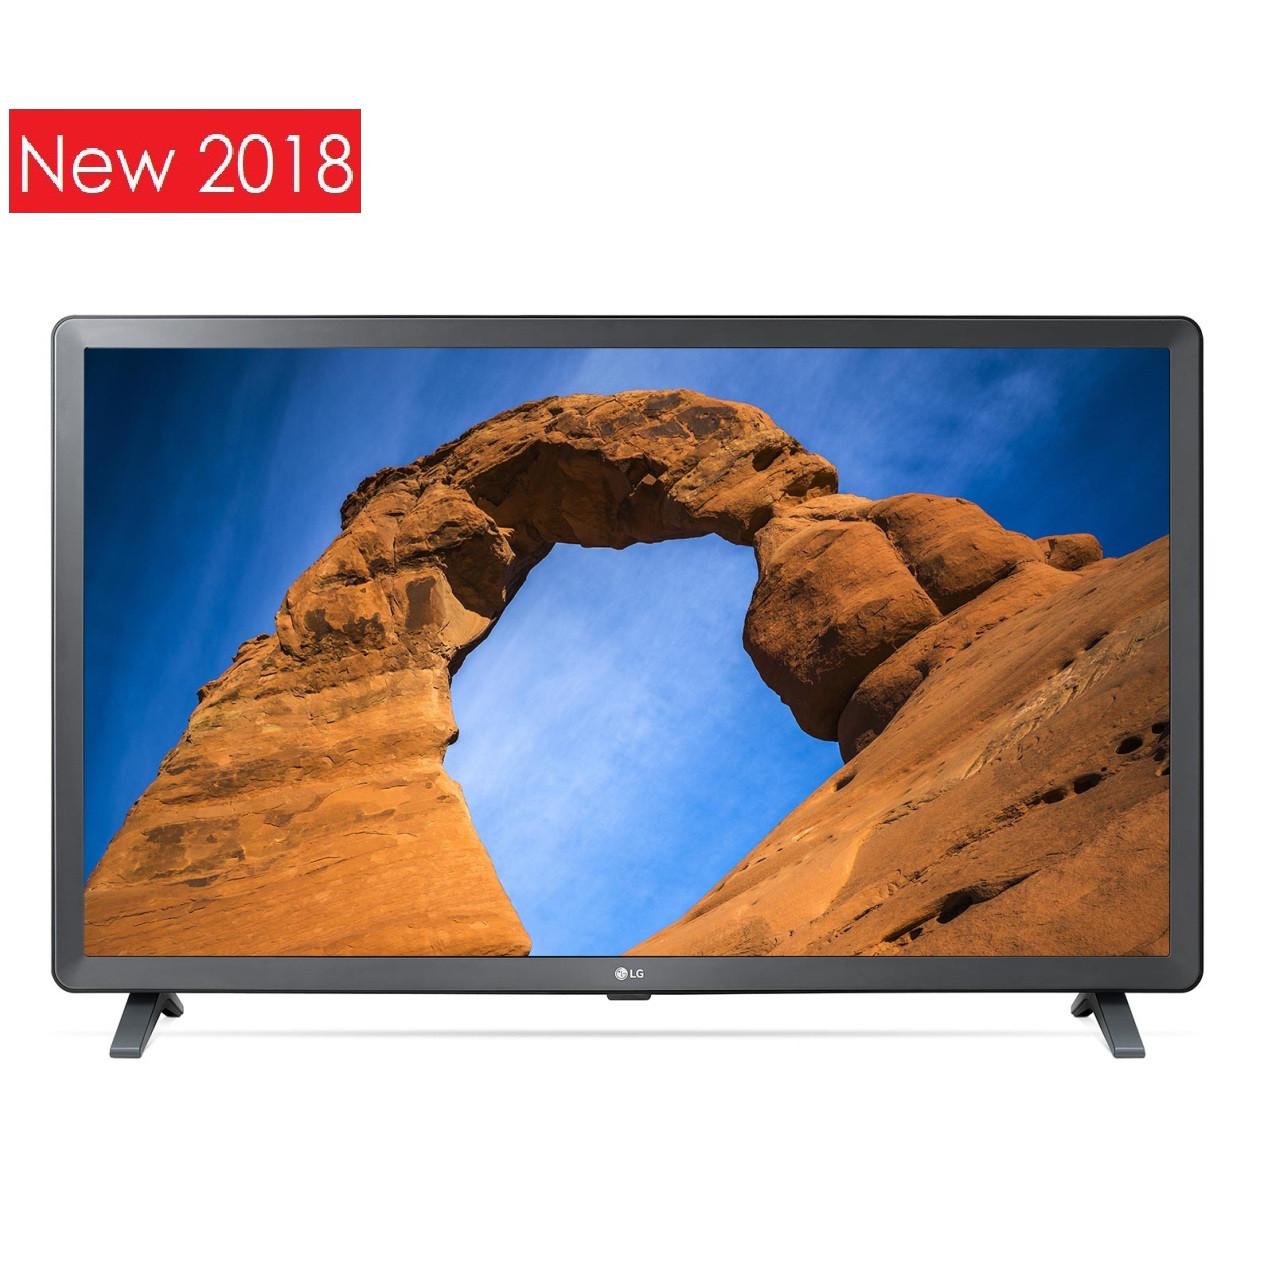 Телевизор LG 32LK6100 ( FullHD, Smart, TM100Hz, Active HDR, DVB-C/T2/S2 )